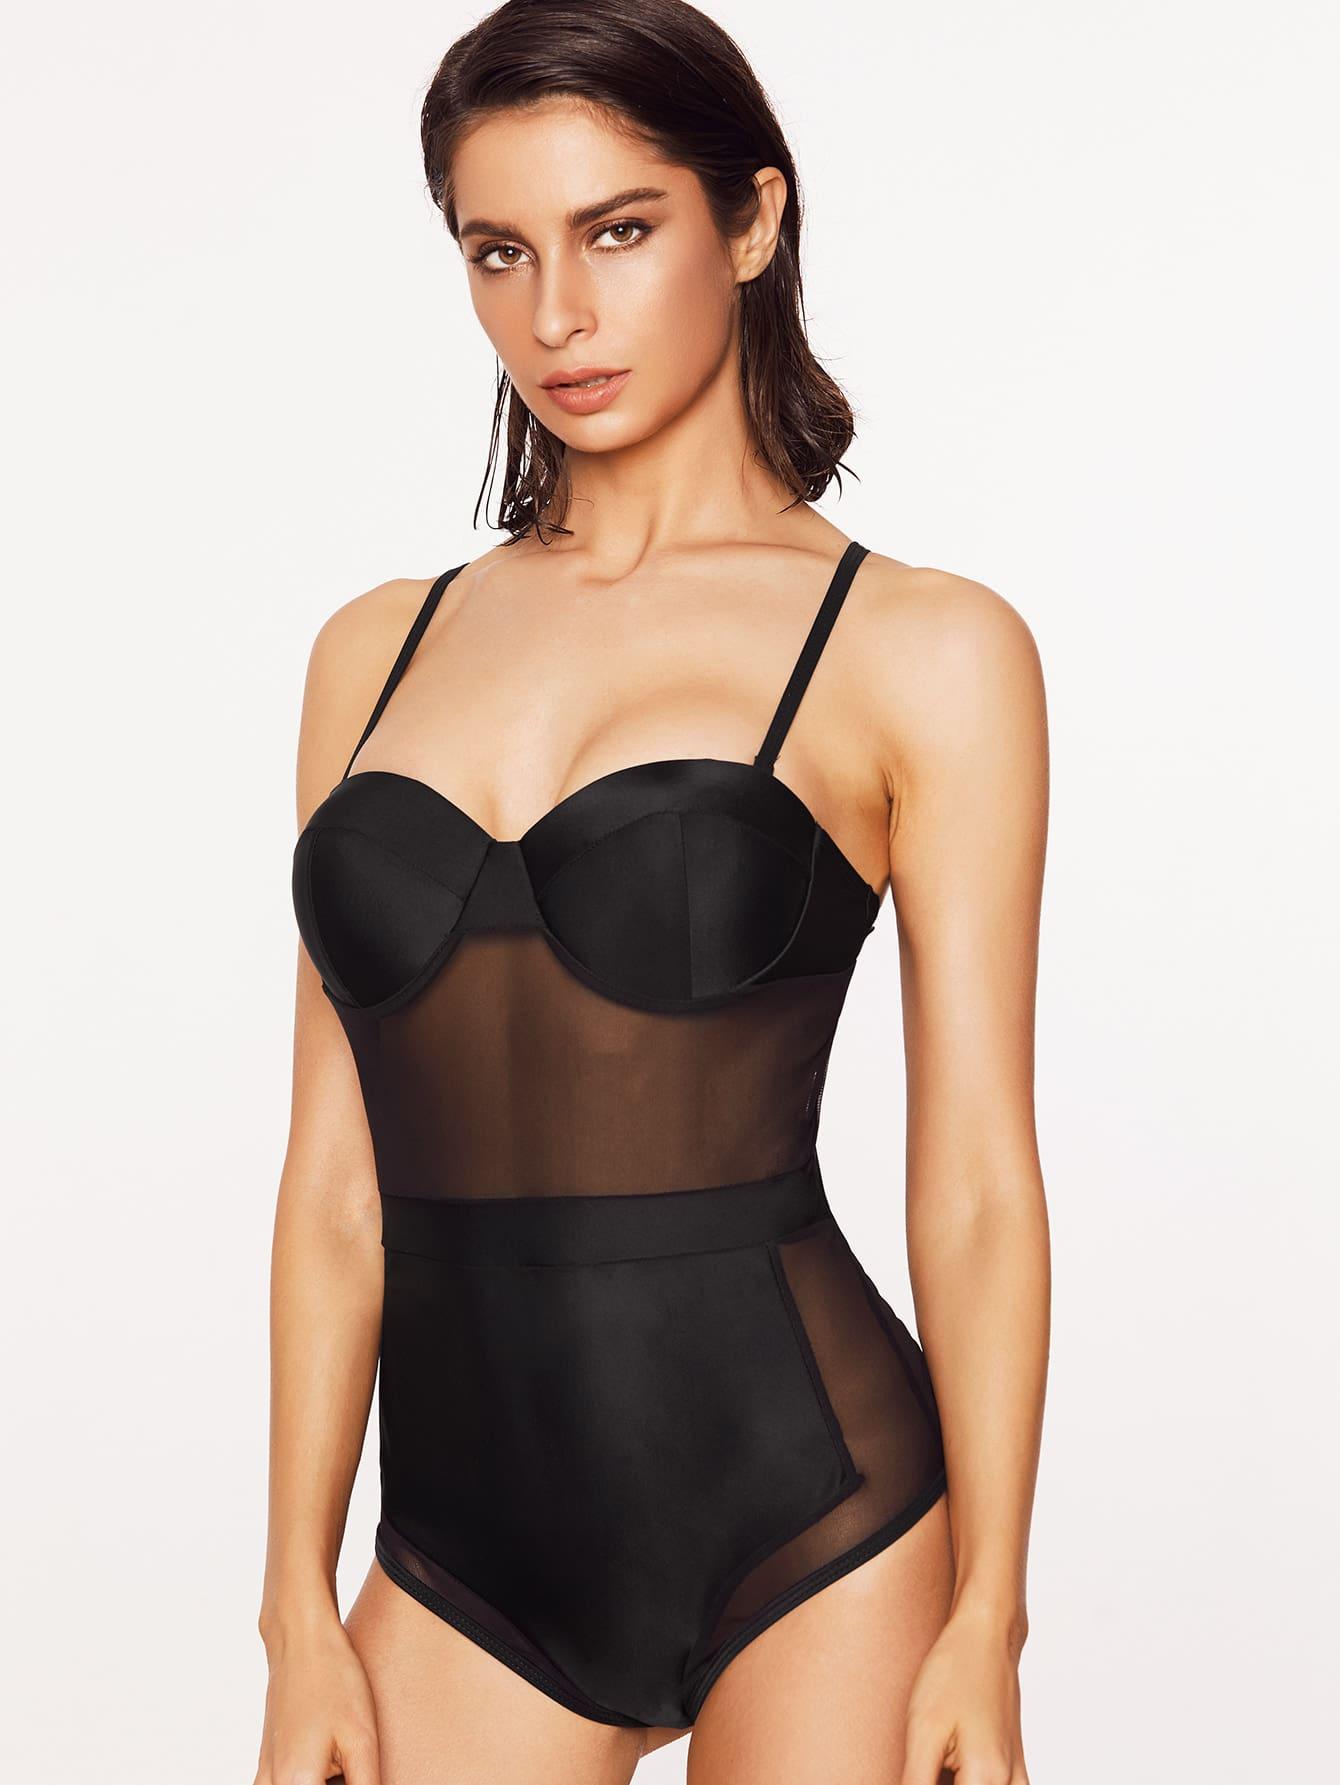 Sheer Mesh Design Bustier Swimsuit Shein Sheinside